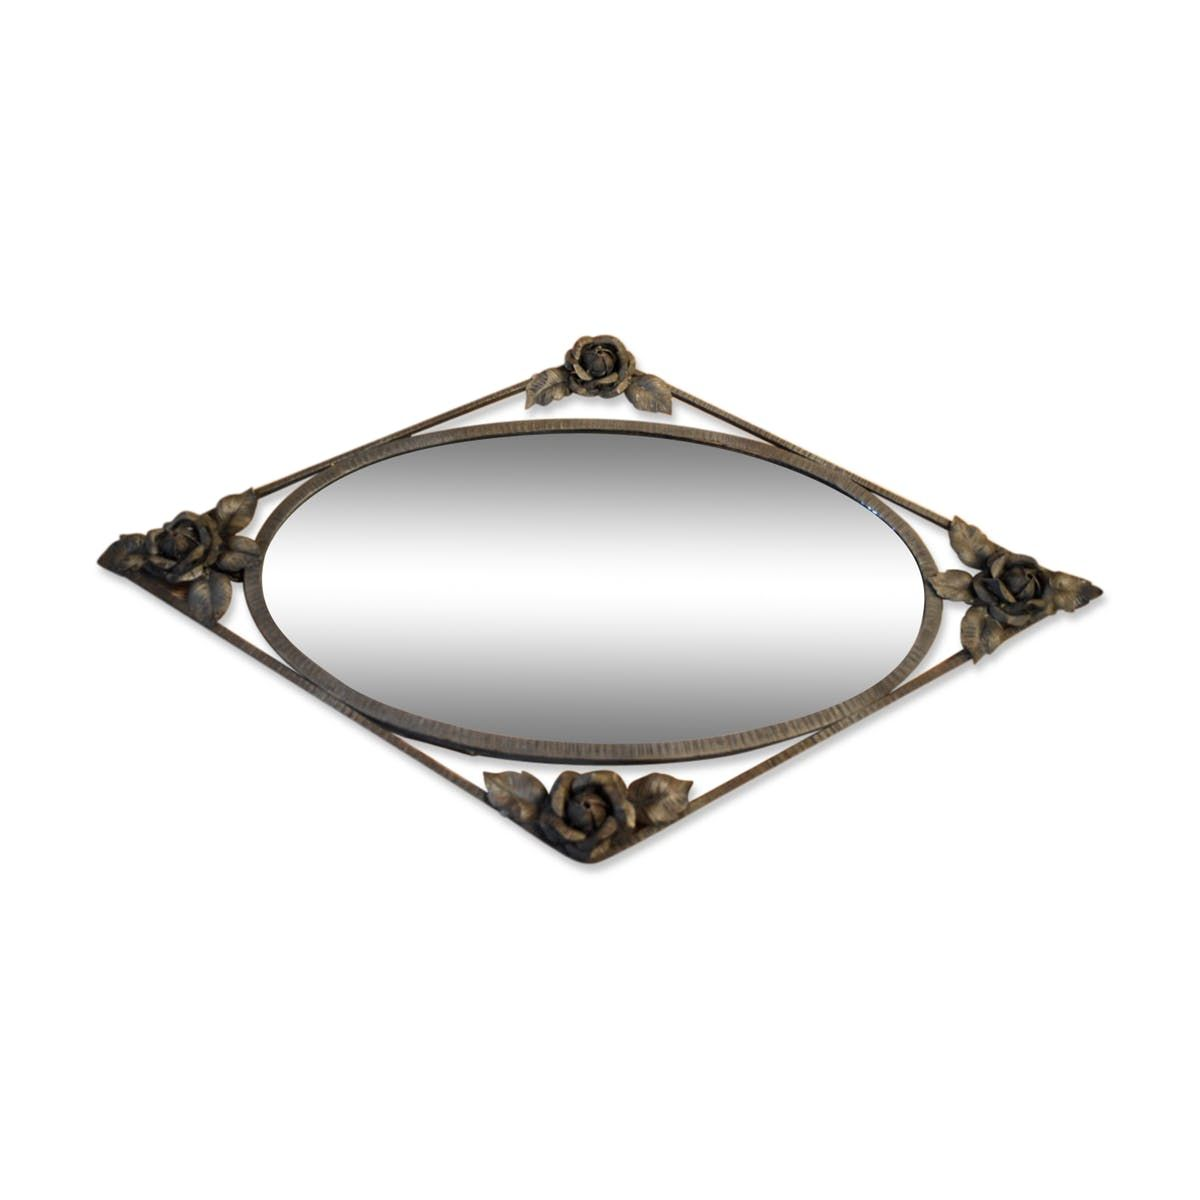 Vintage art deco spiegel bei pamono kaufen for Classic art deco